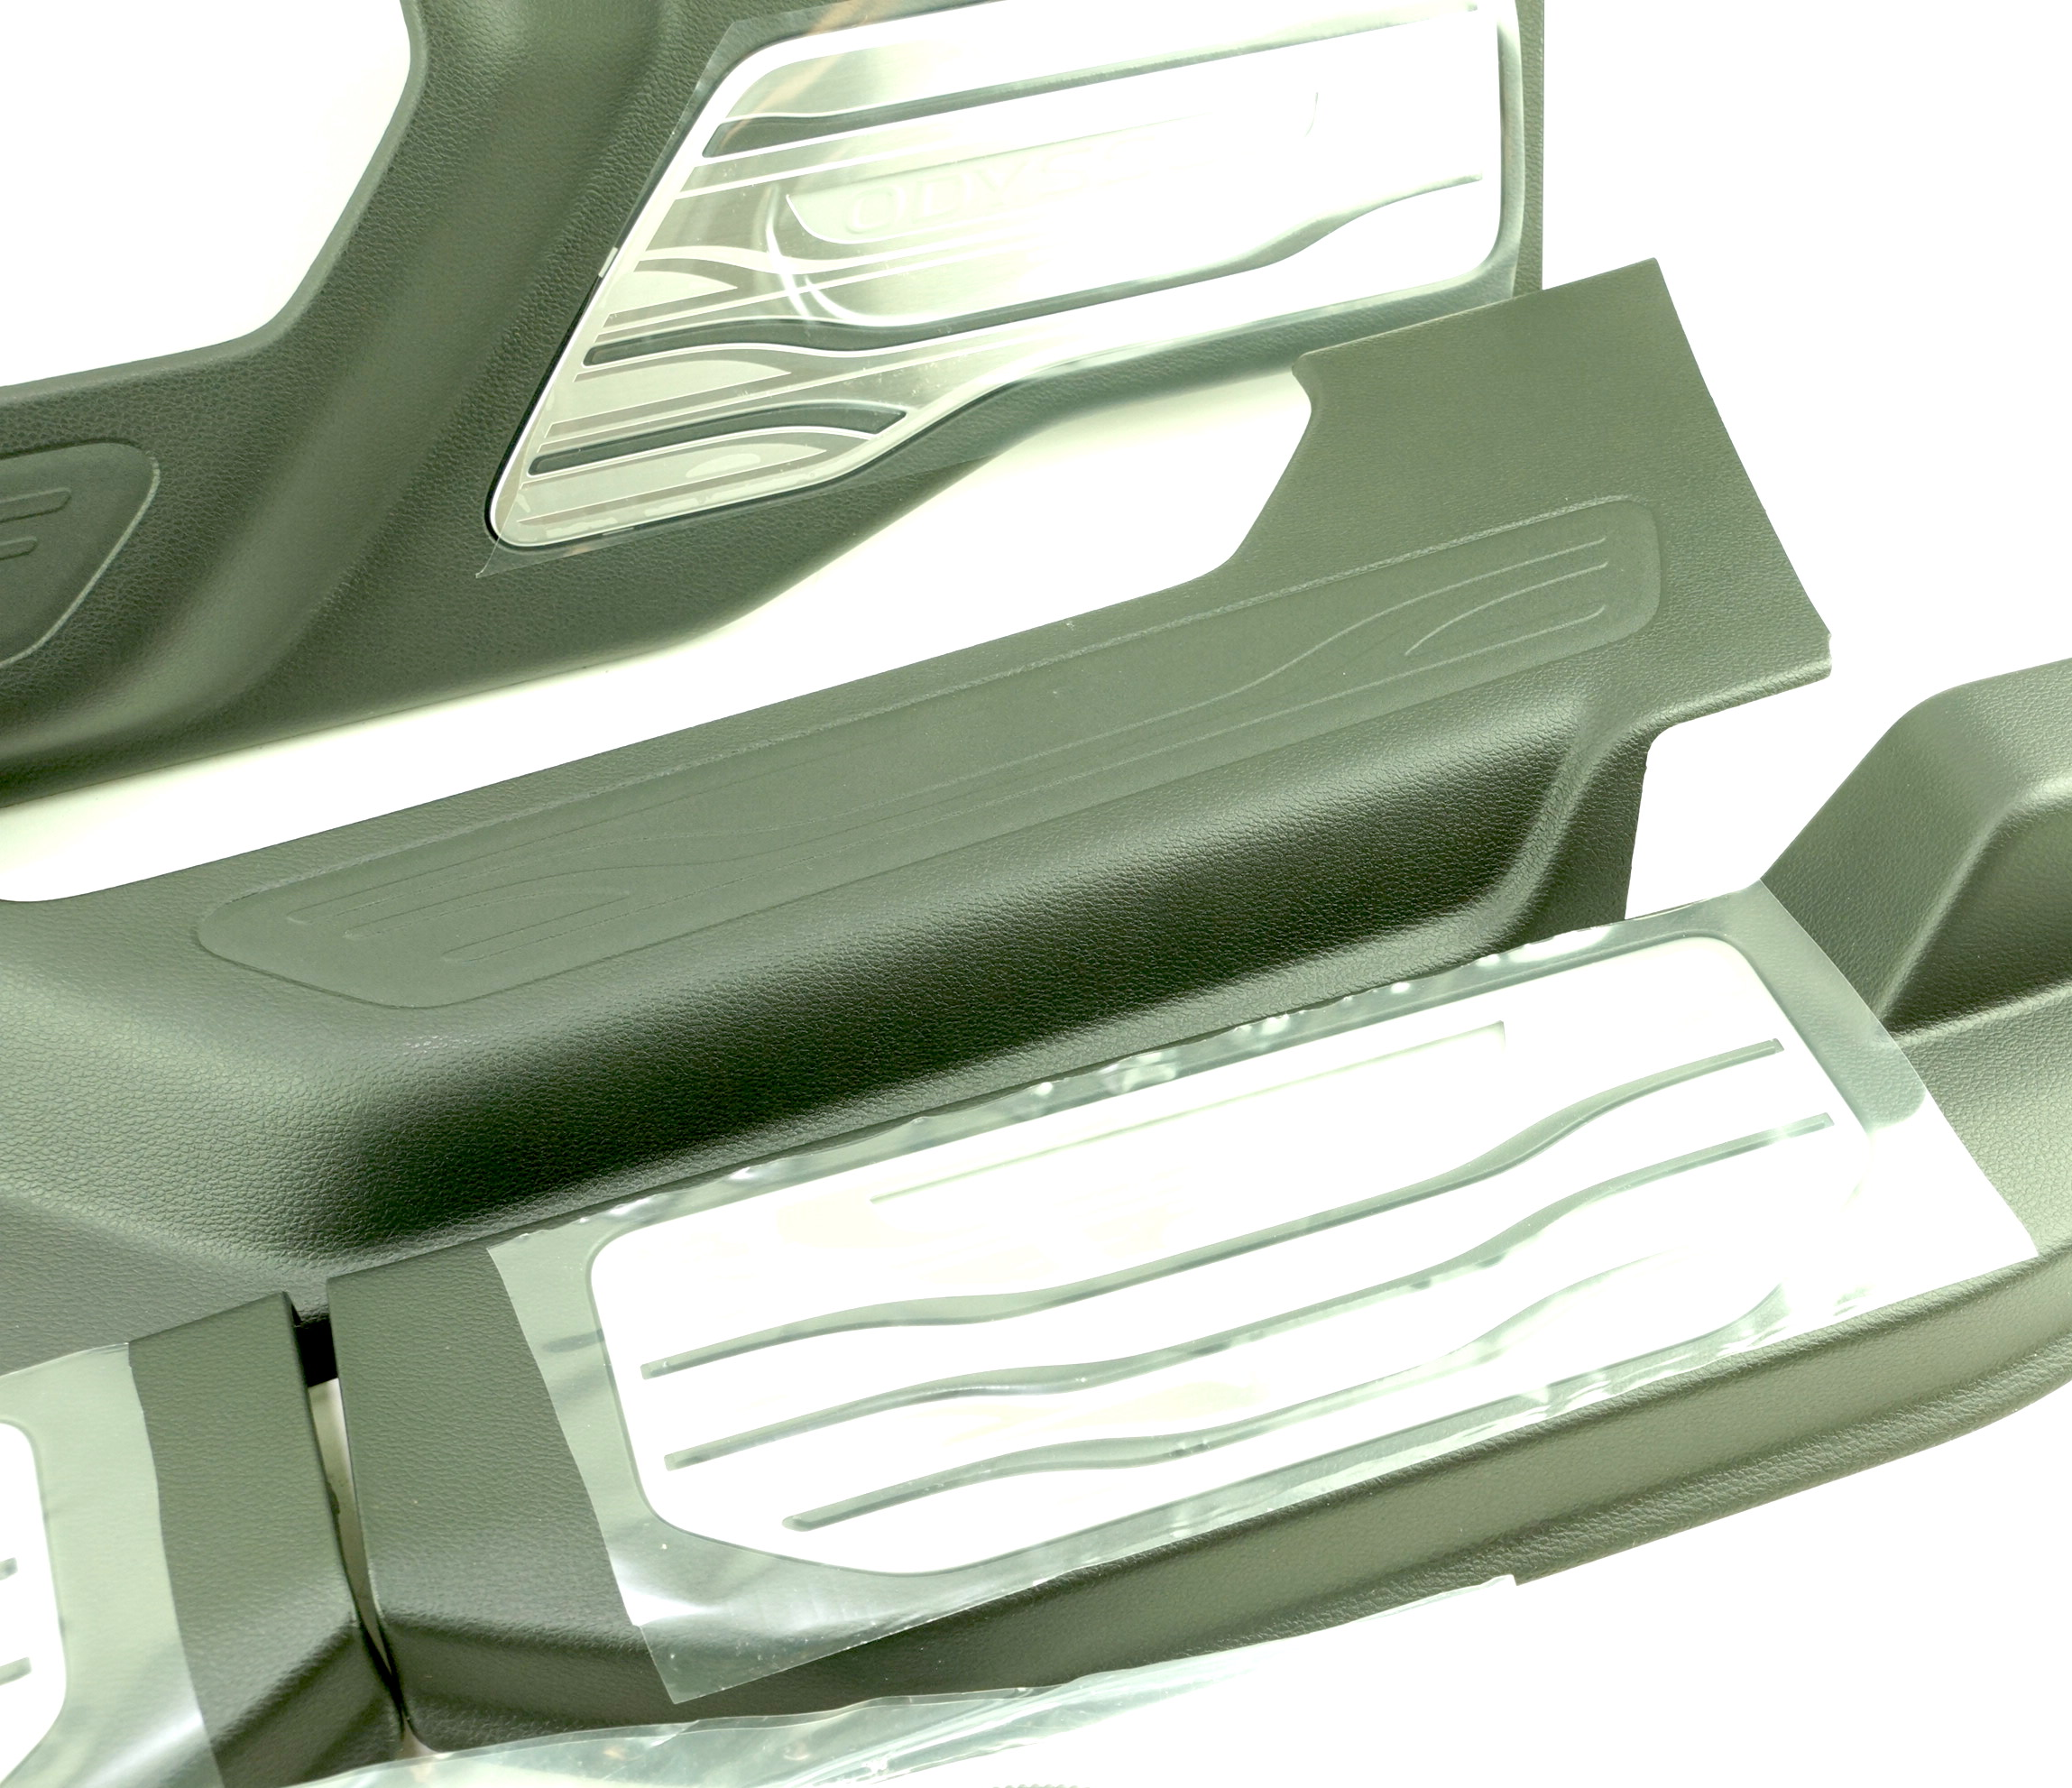 OEM 08E12THR100B Genuine Honda Odyssey 25th Anniversary Illuminated Door Sill - image 12